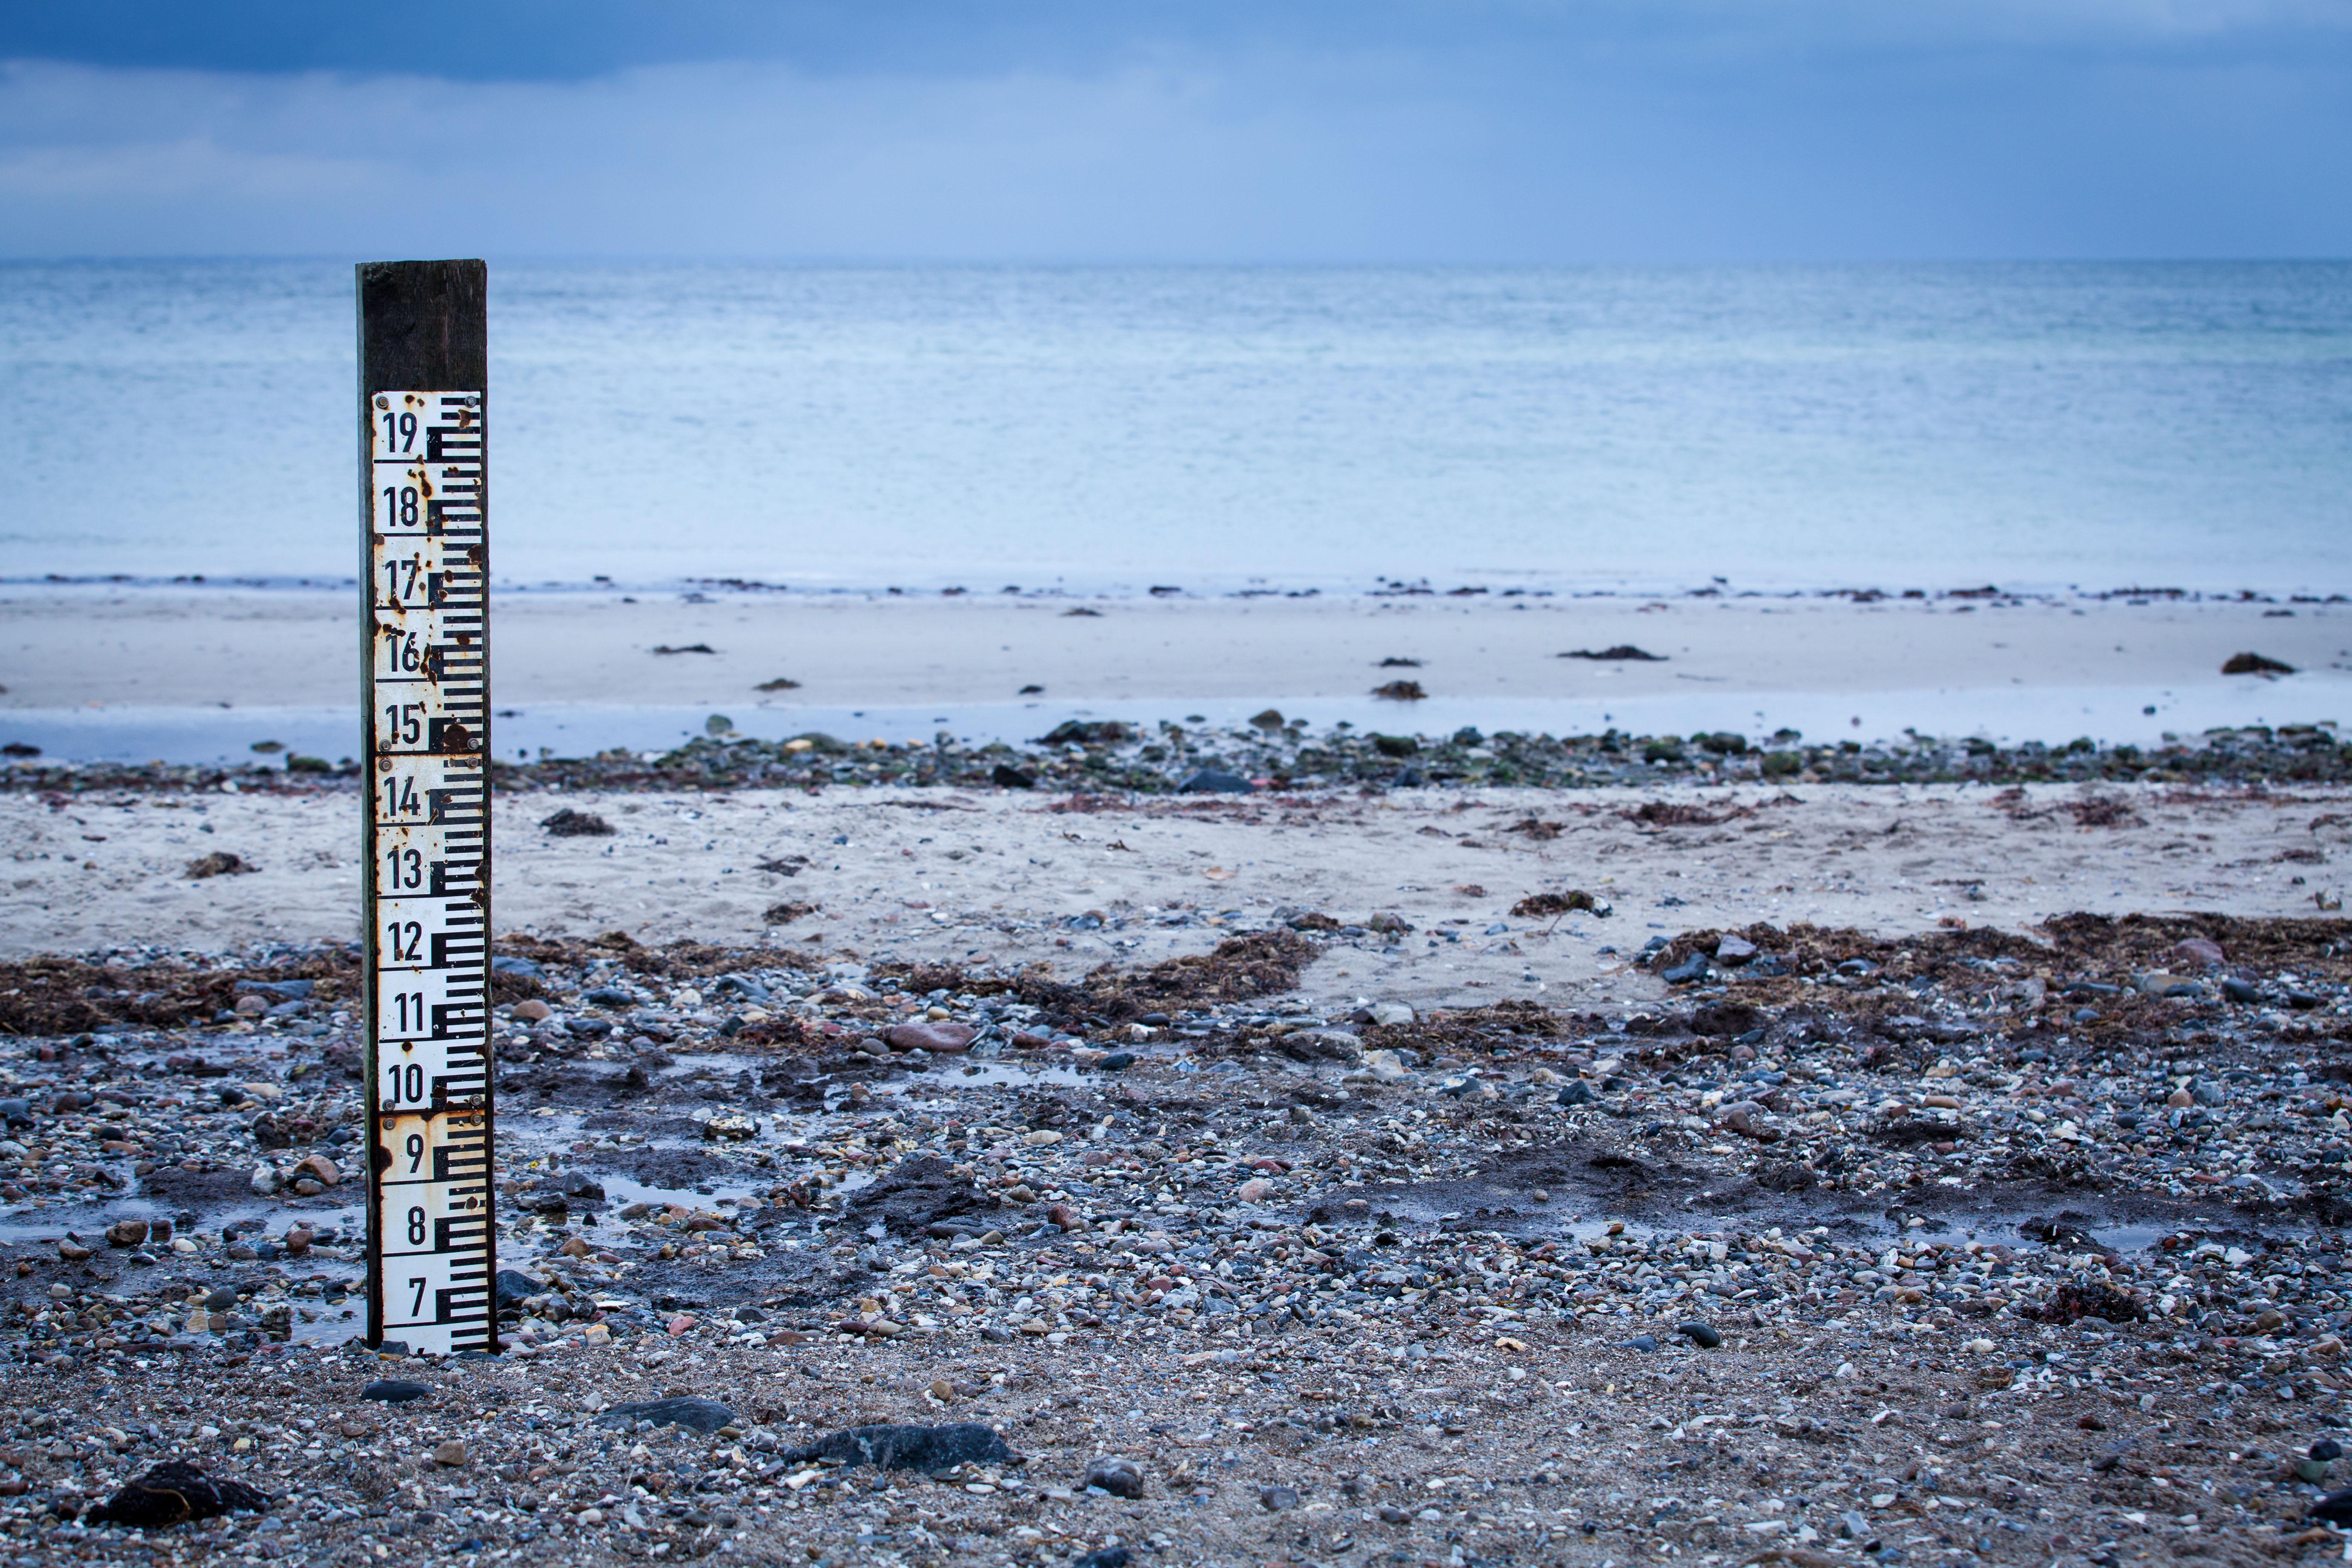 high & low tide marker. photo: JL-Pfeifer / shutterstock.com